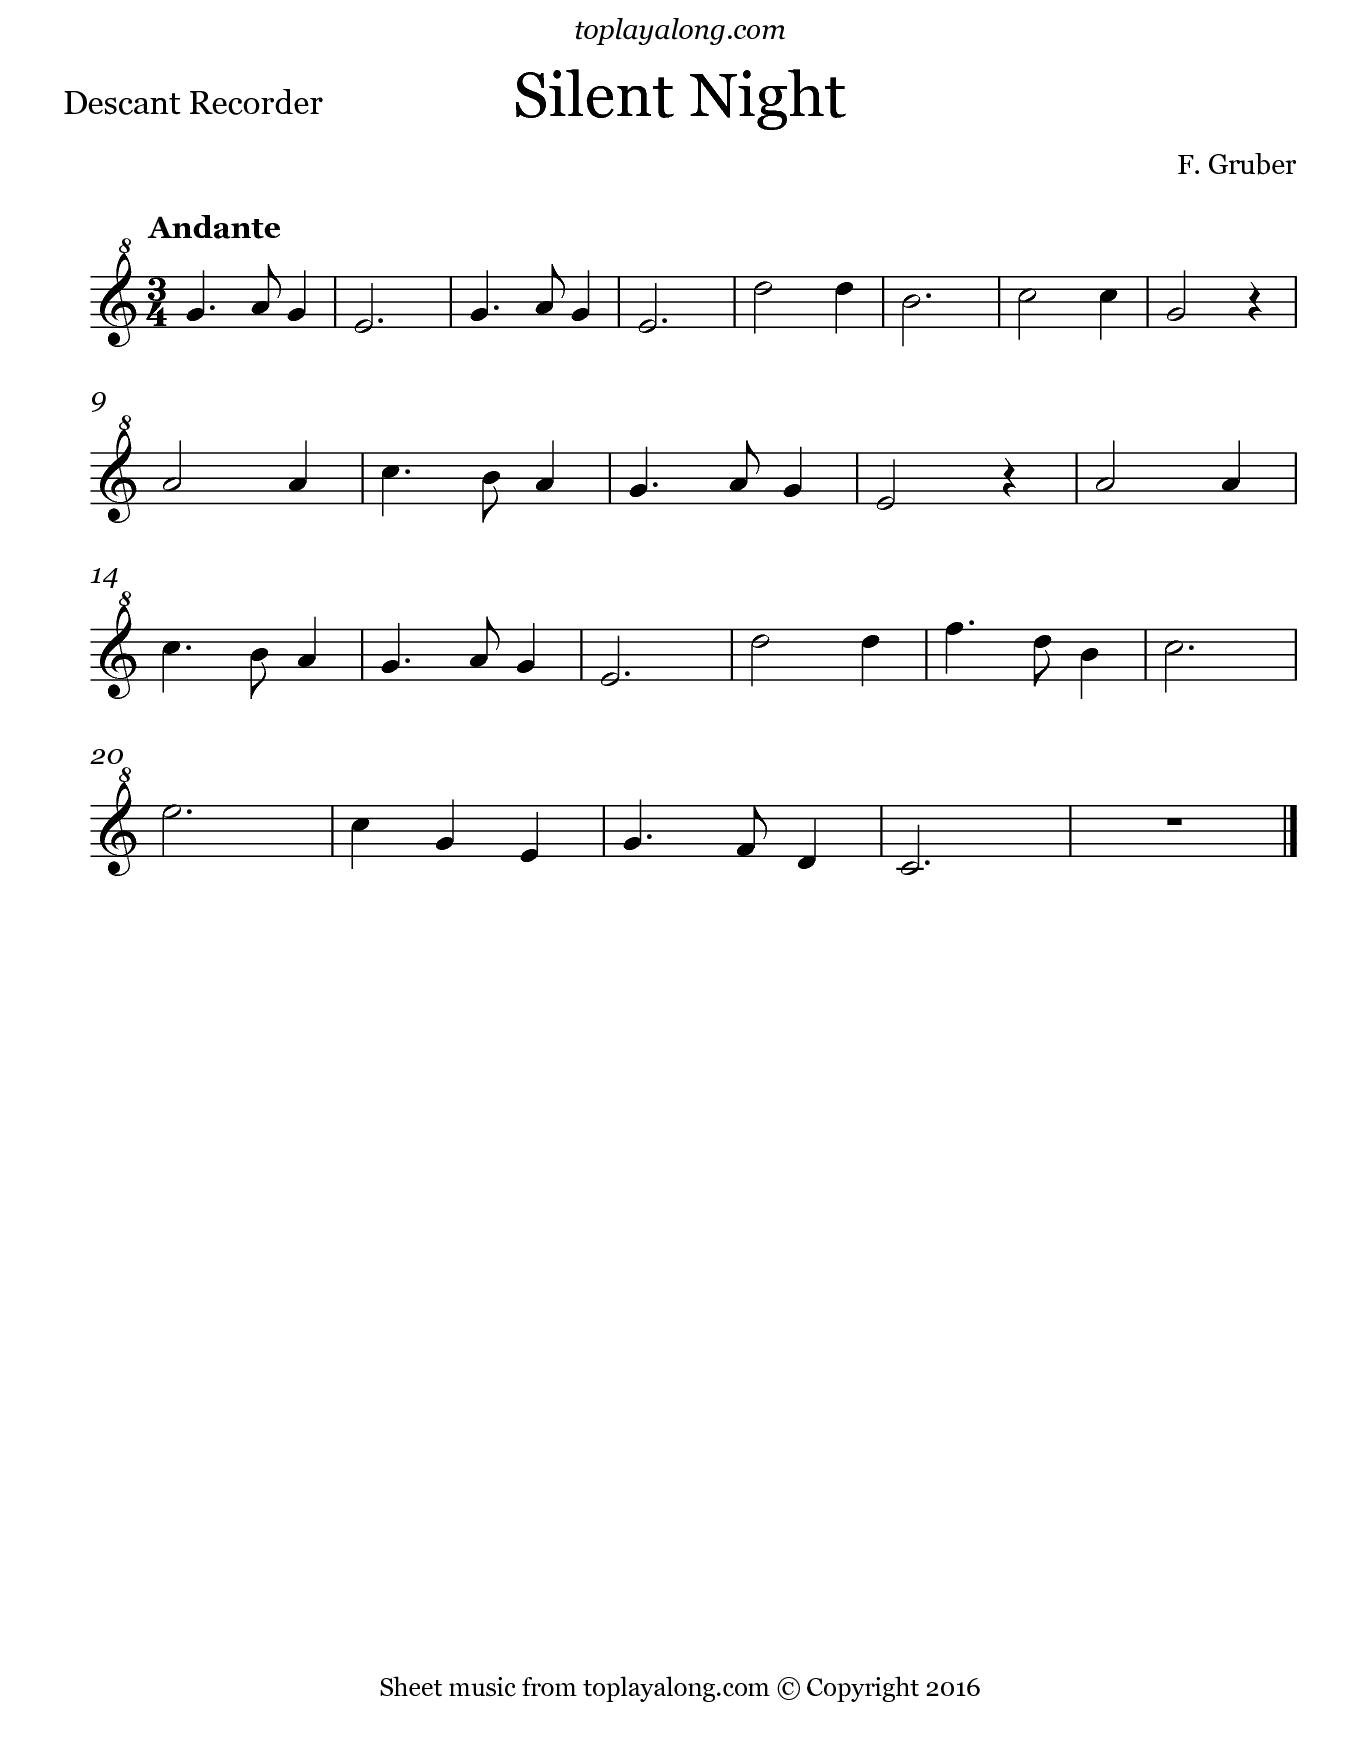 toplayalong.com > Sheet Music > Recorder > Gruber - Silent Night